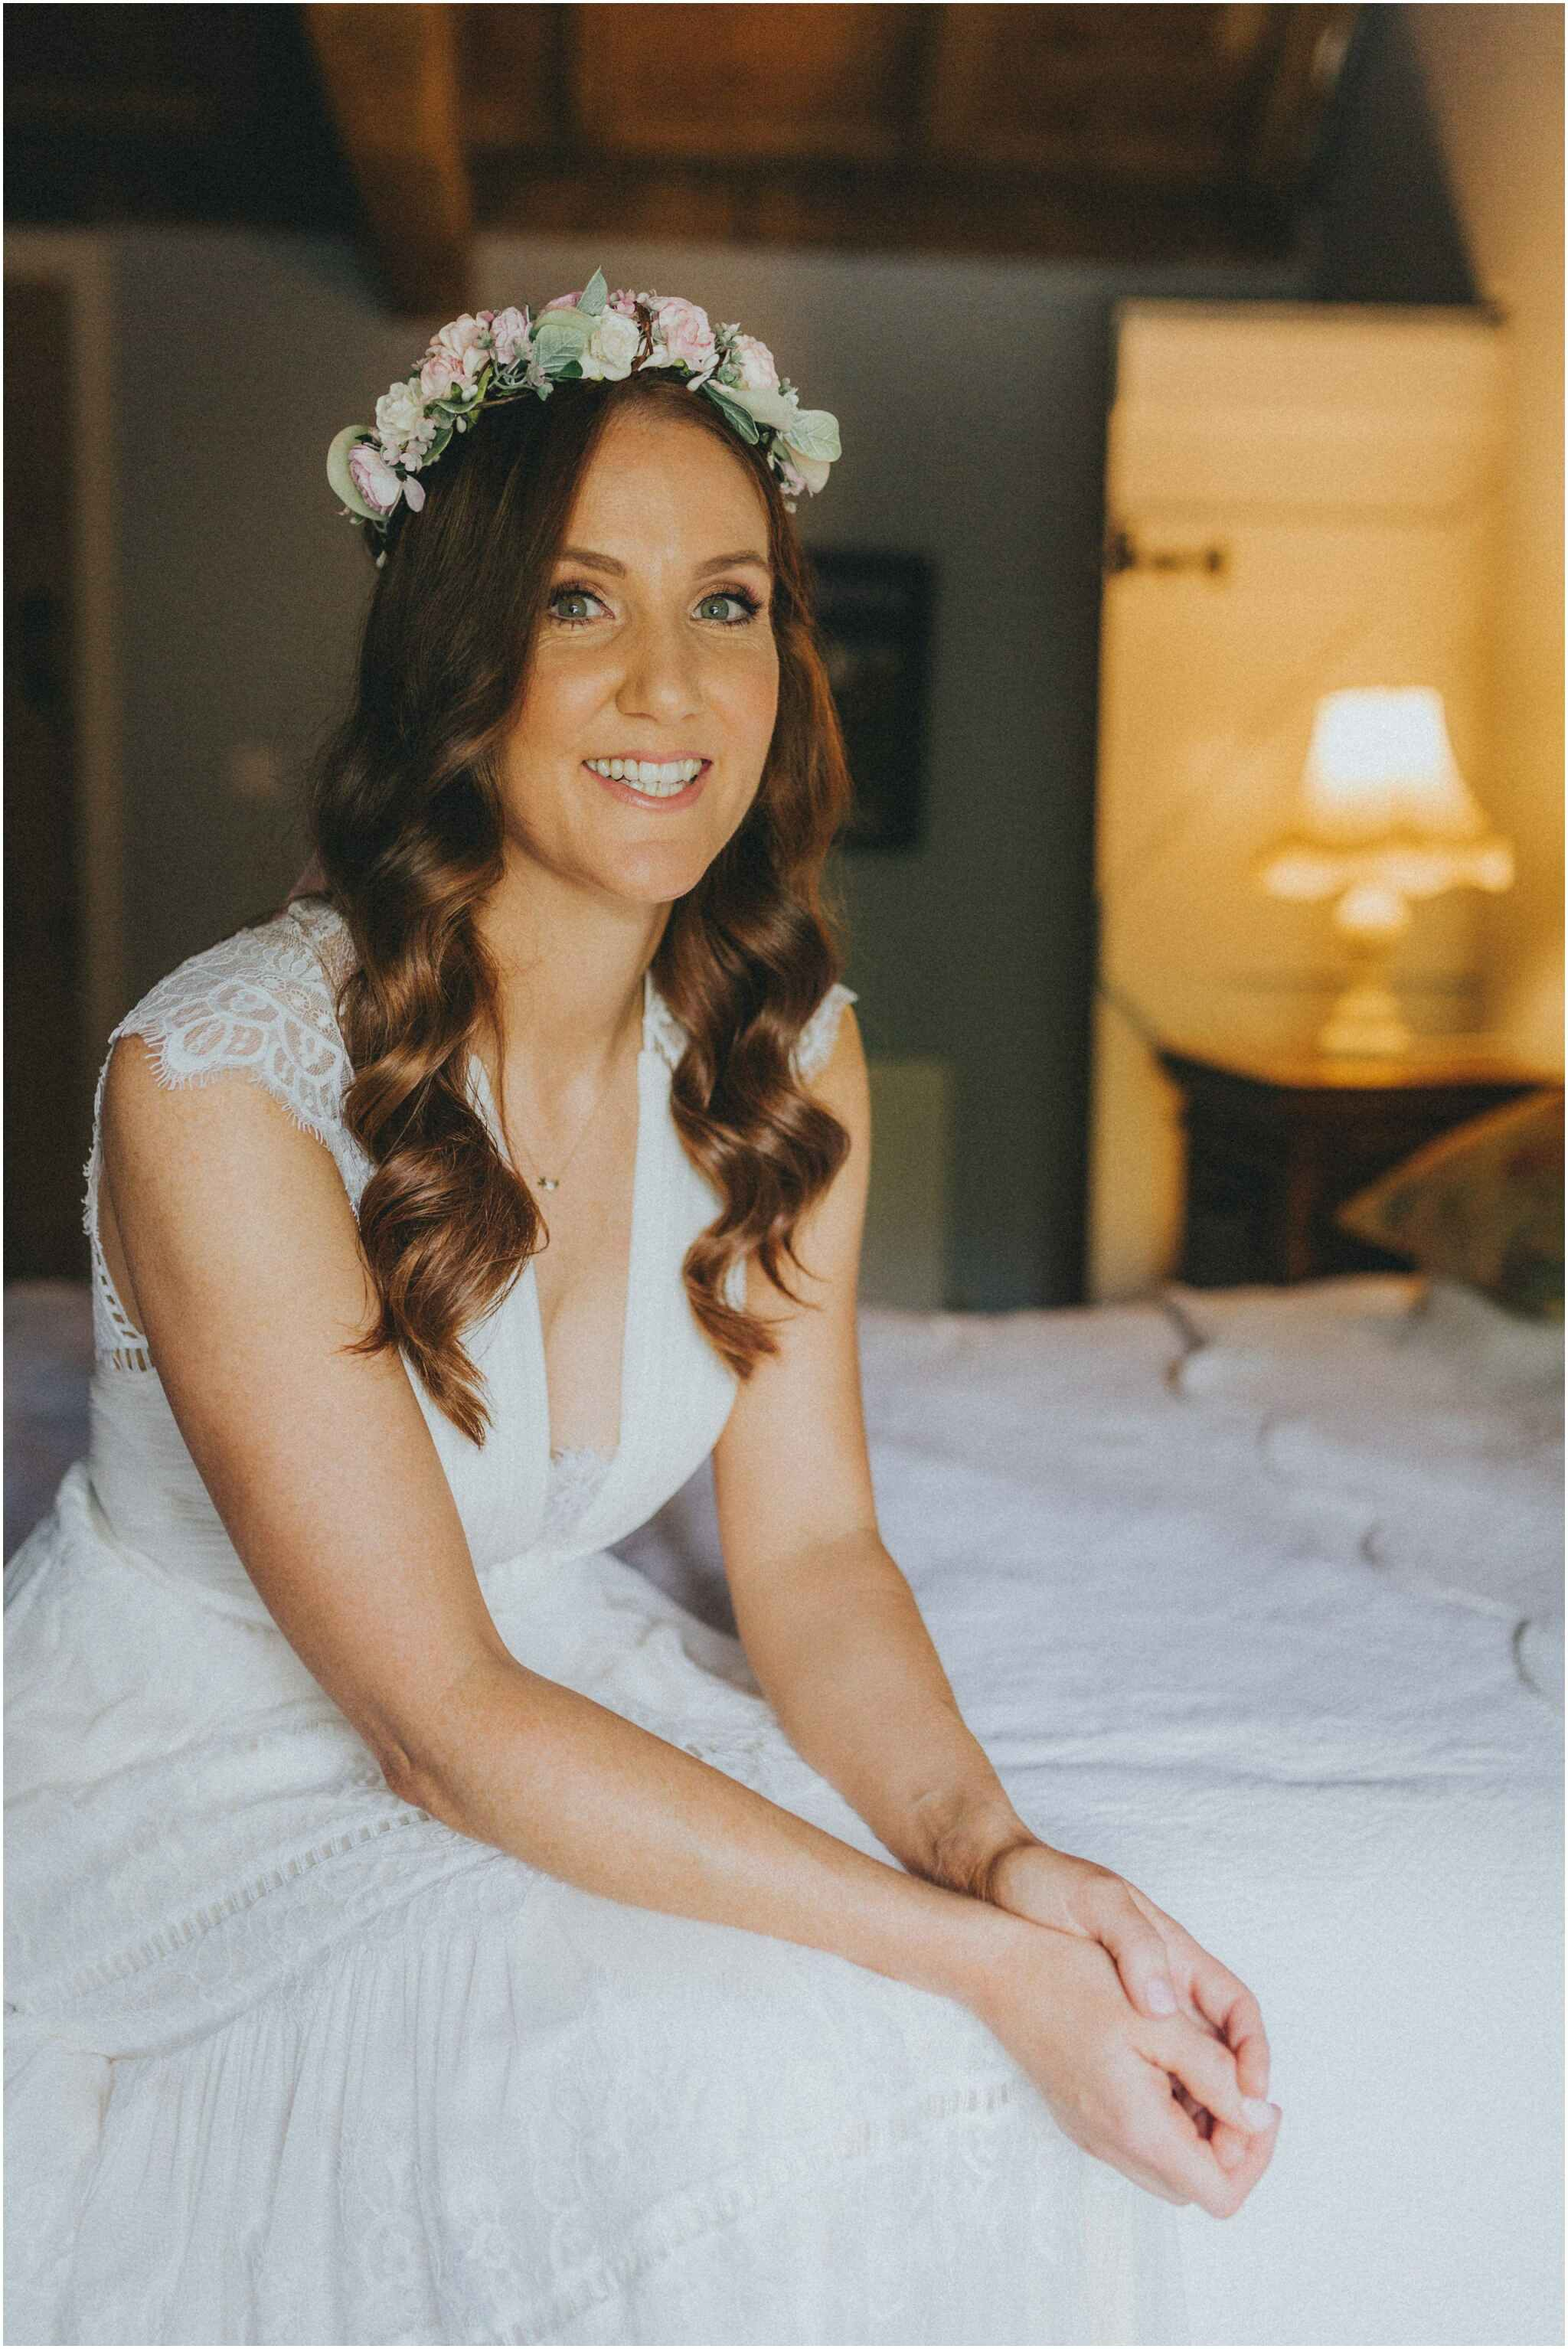 Fionnuala + Paul - Mount Druid Alternative Wedding 52